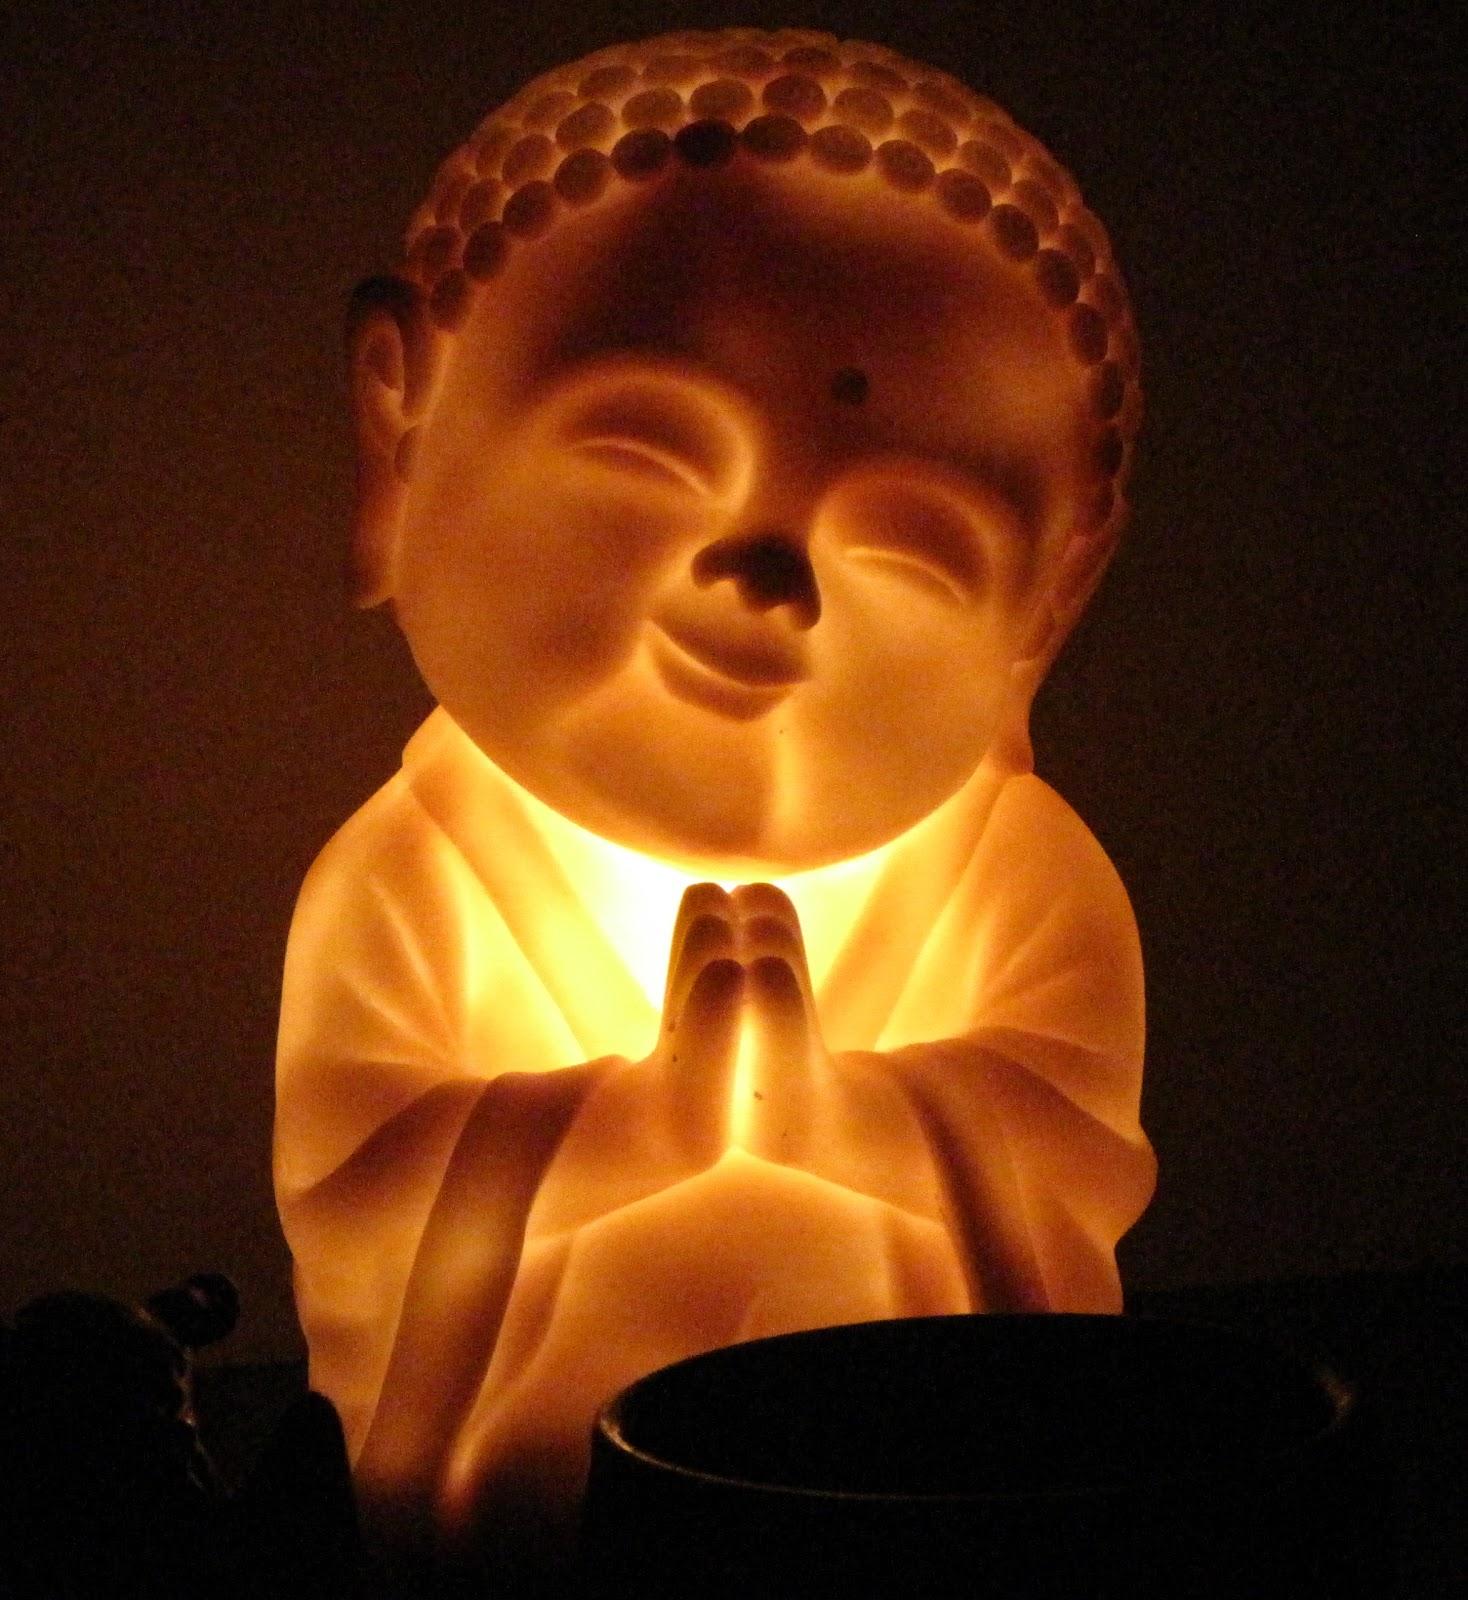 Cute Baby Buddah Night Light Celebrate Pinterest